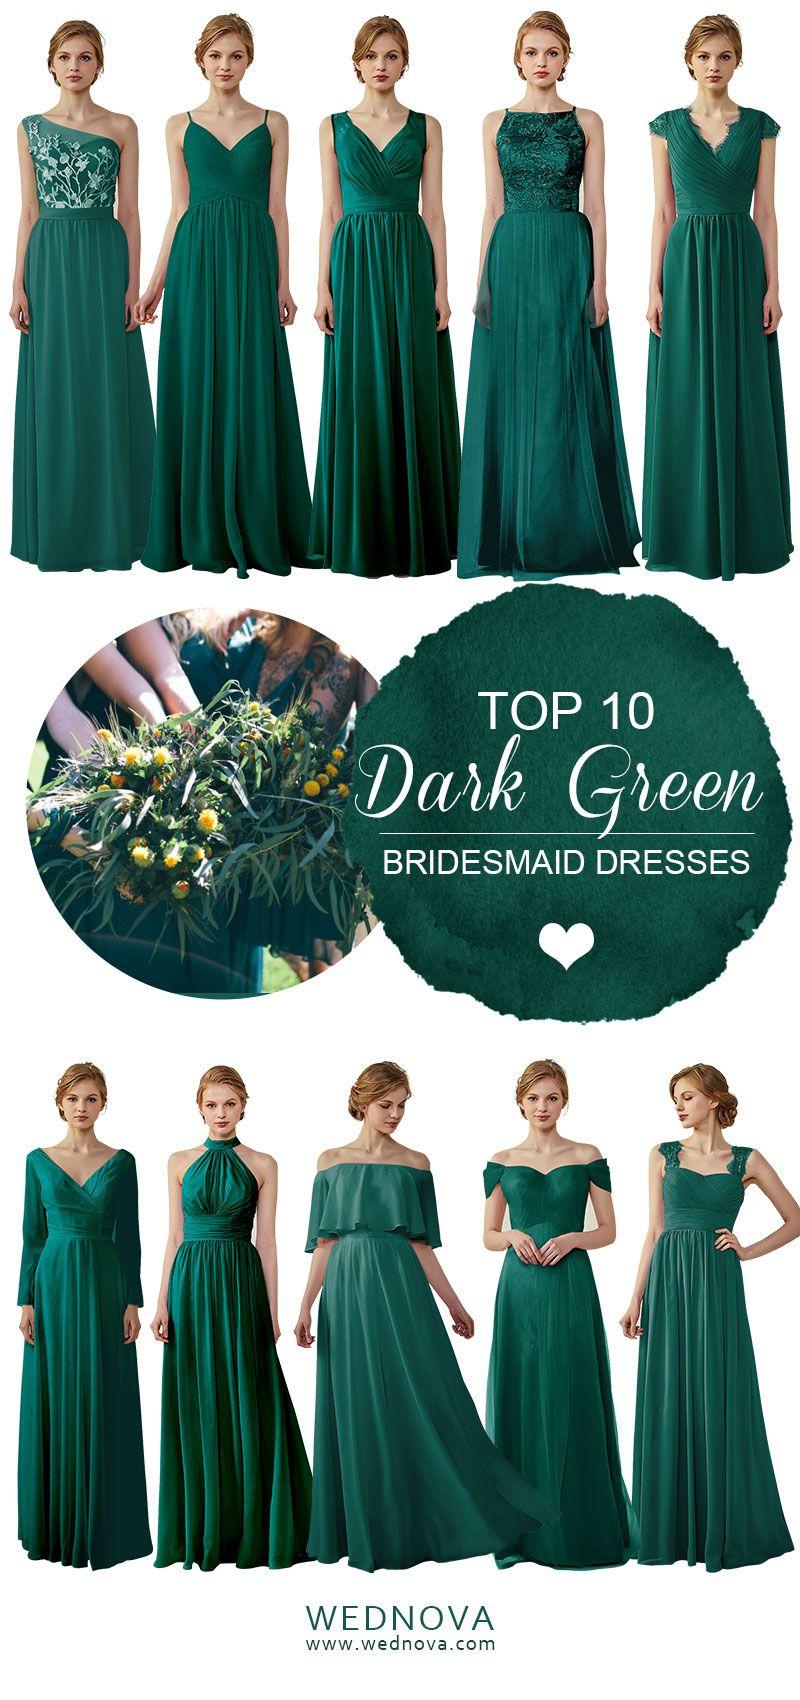 Dark Green Chiffon Bridesmaid Dress High Quality Halter Dress V Neck Dress With Dark Green Bridesmaid Dress Green Bridesmaid Dresses Summer Bridesmaid Dresses